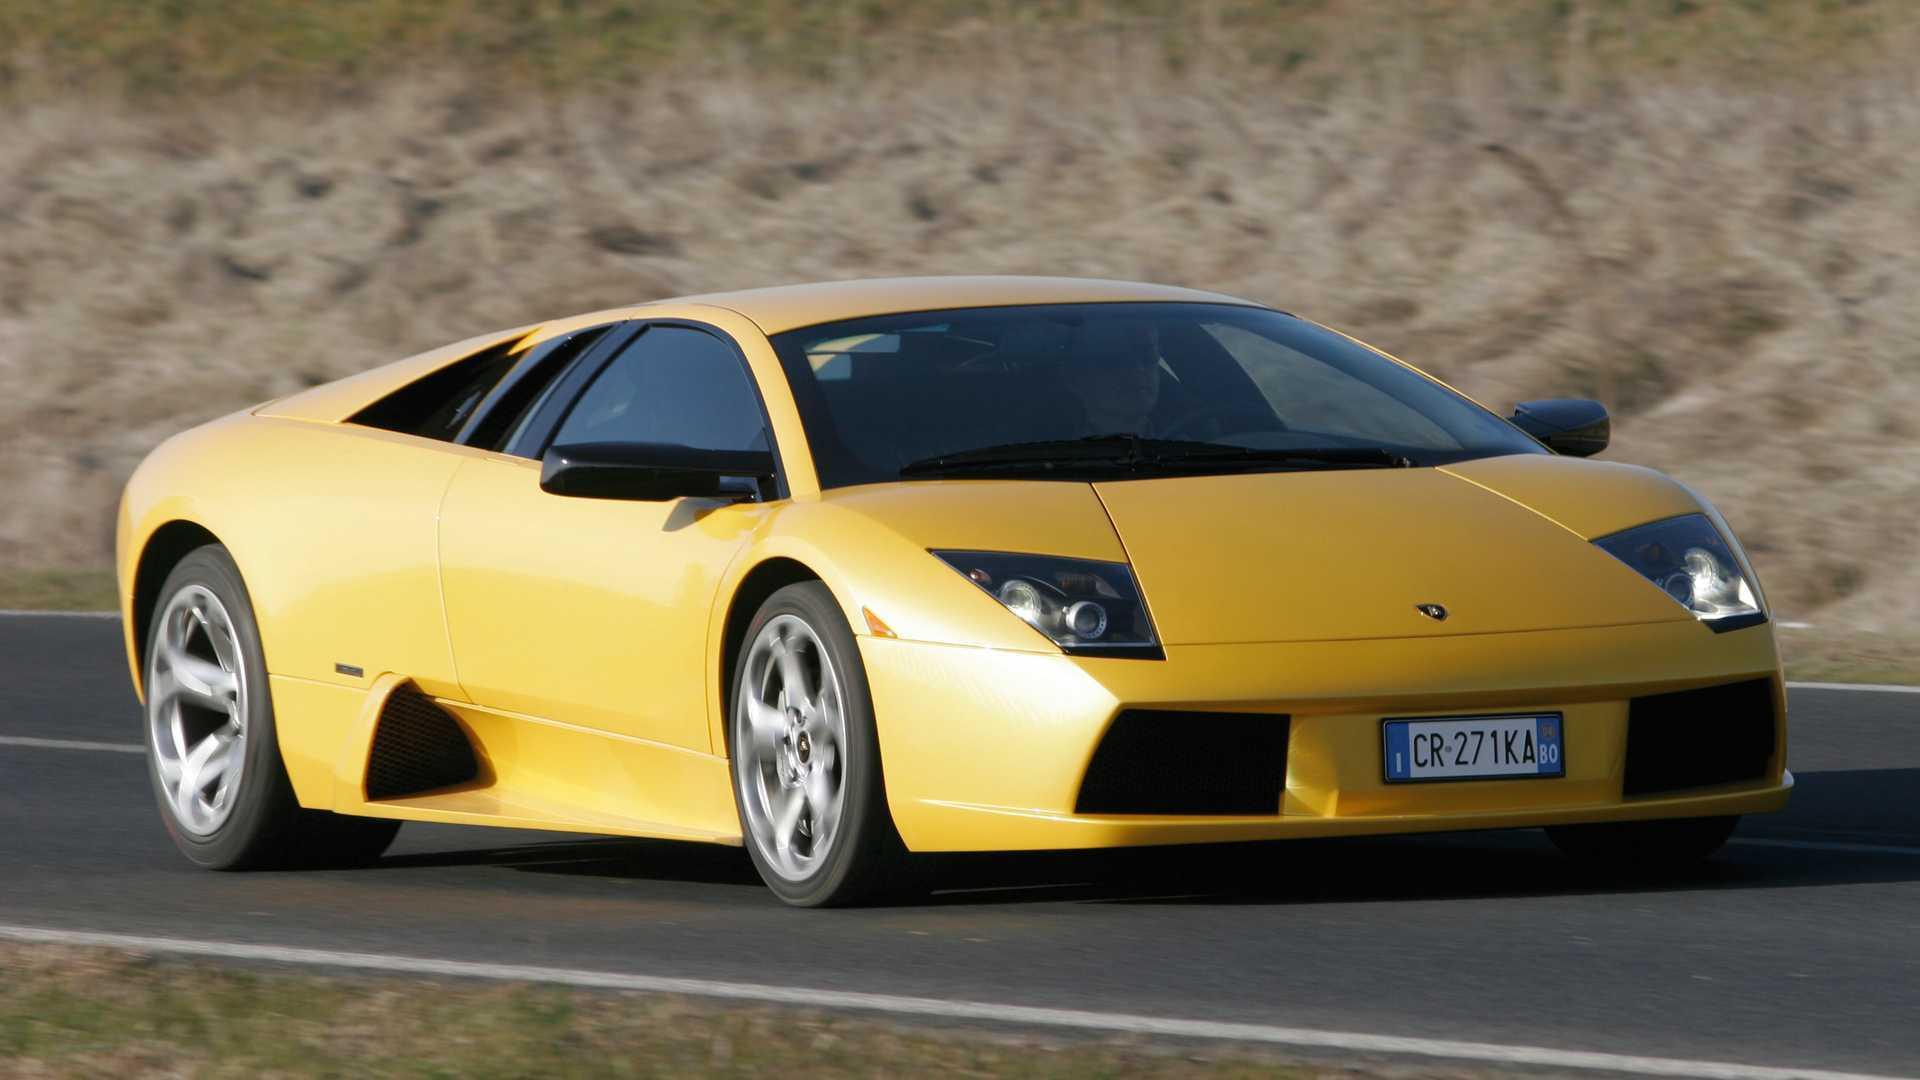 Watch This Nostalgic Lamborghini Murcielago Track Test from 2003